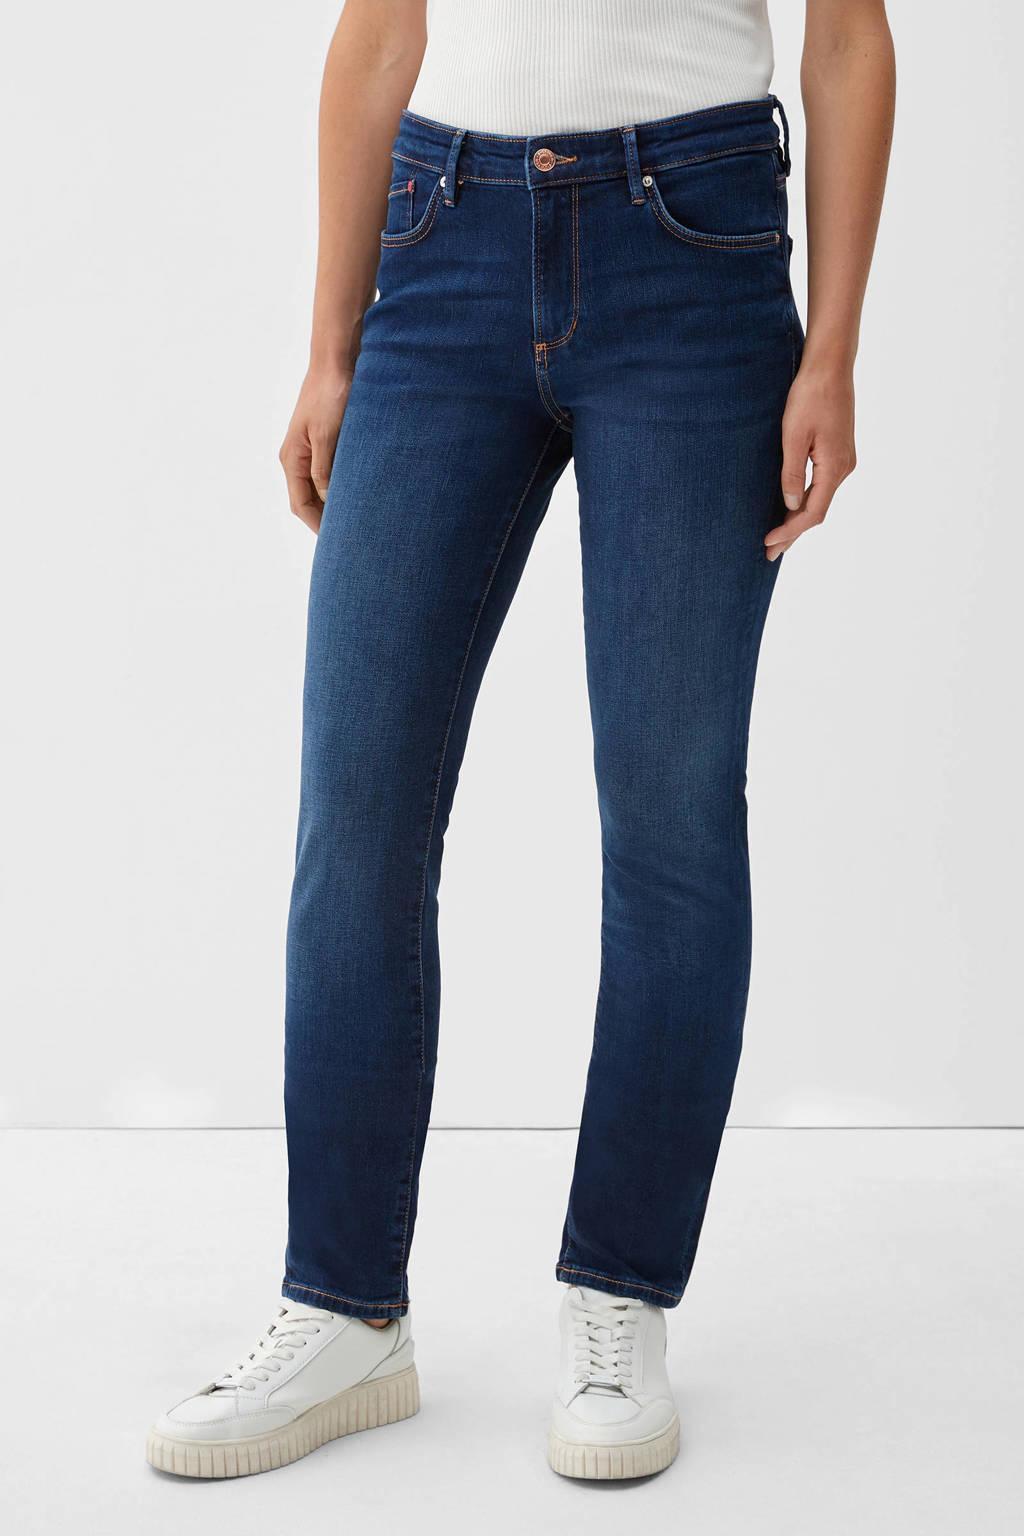 s.Oliver regular fit jeans dark denim, Dark denim